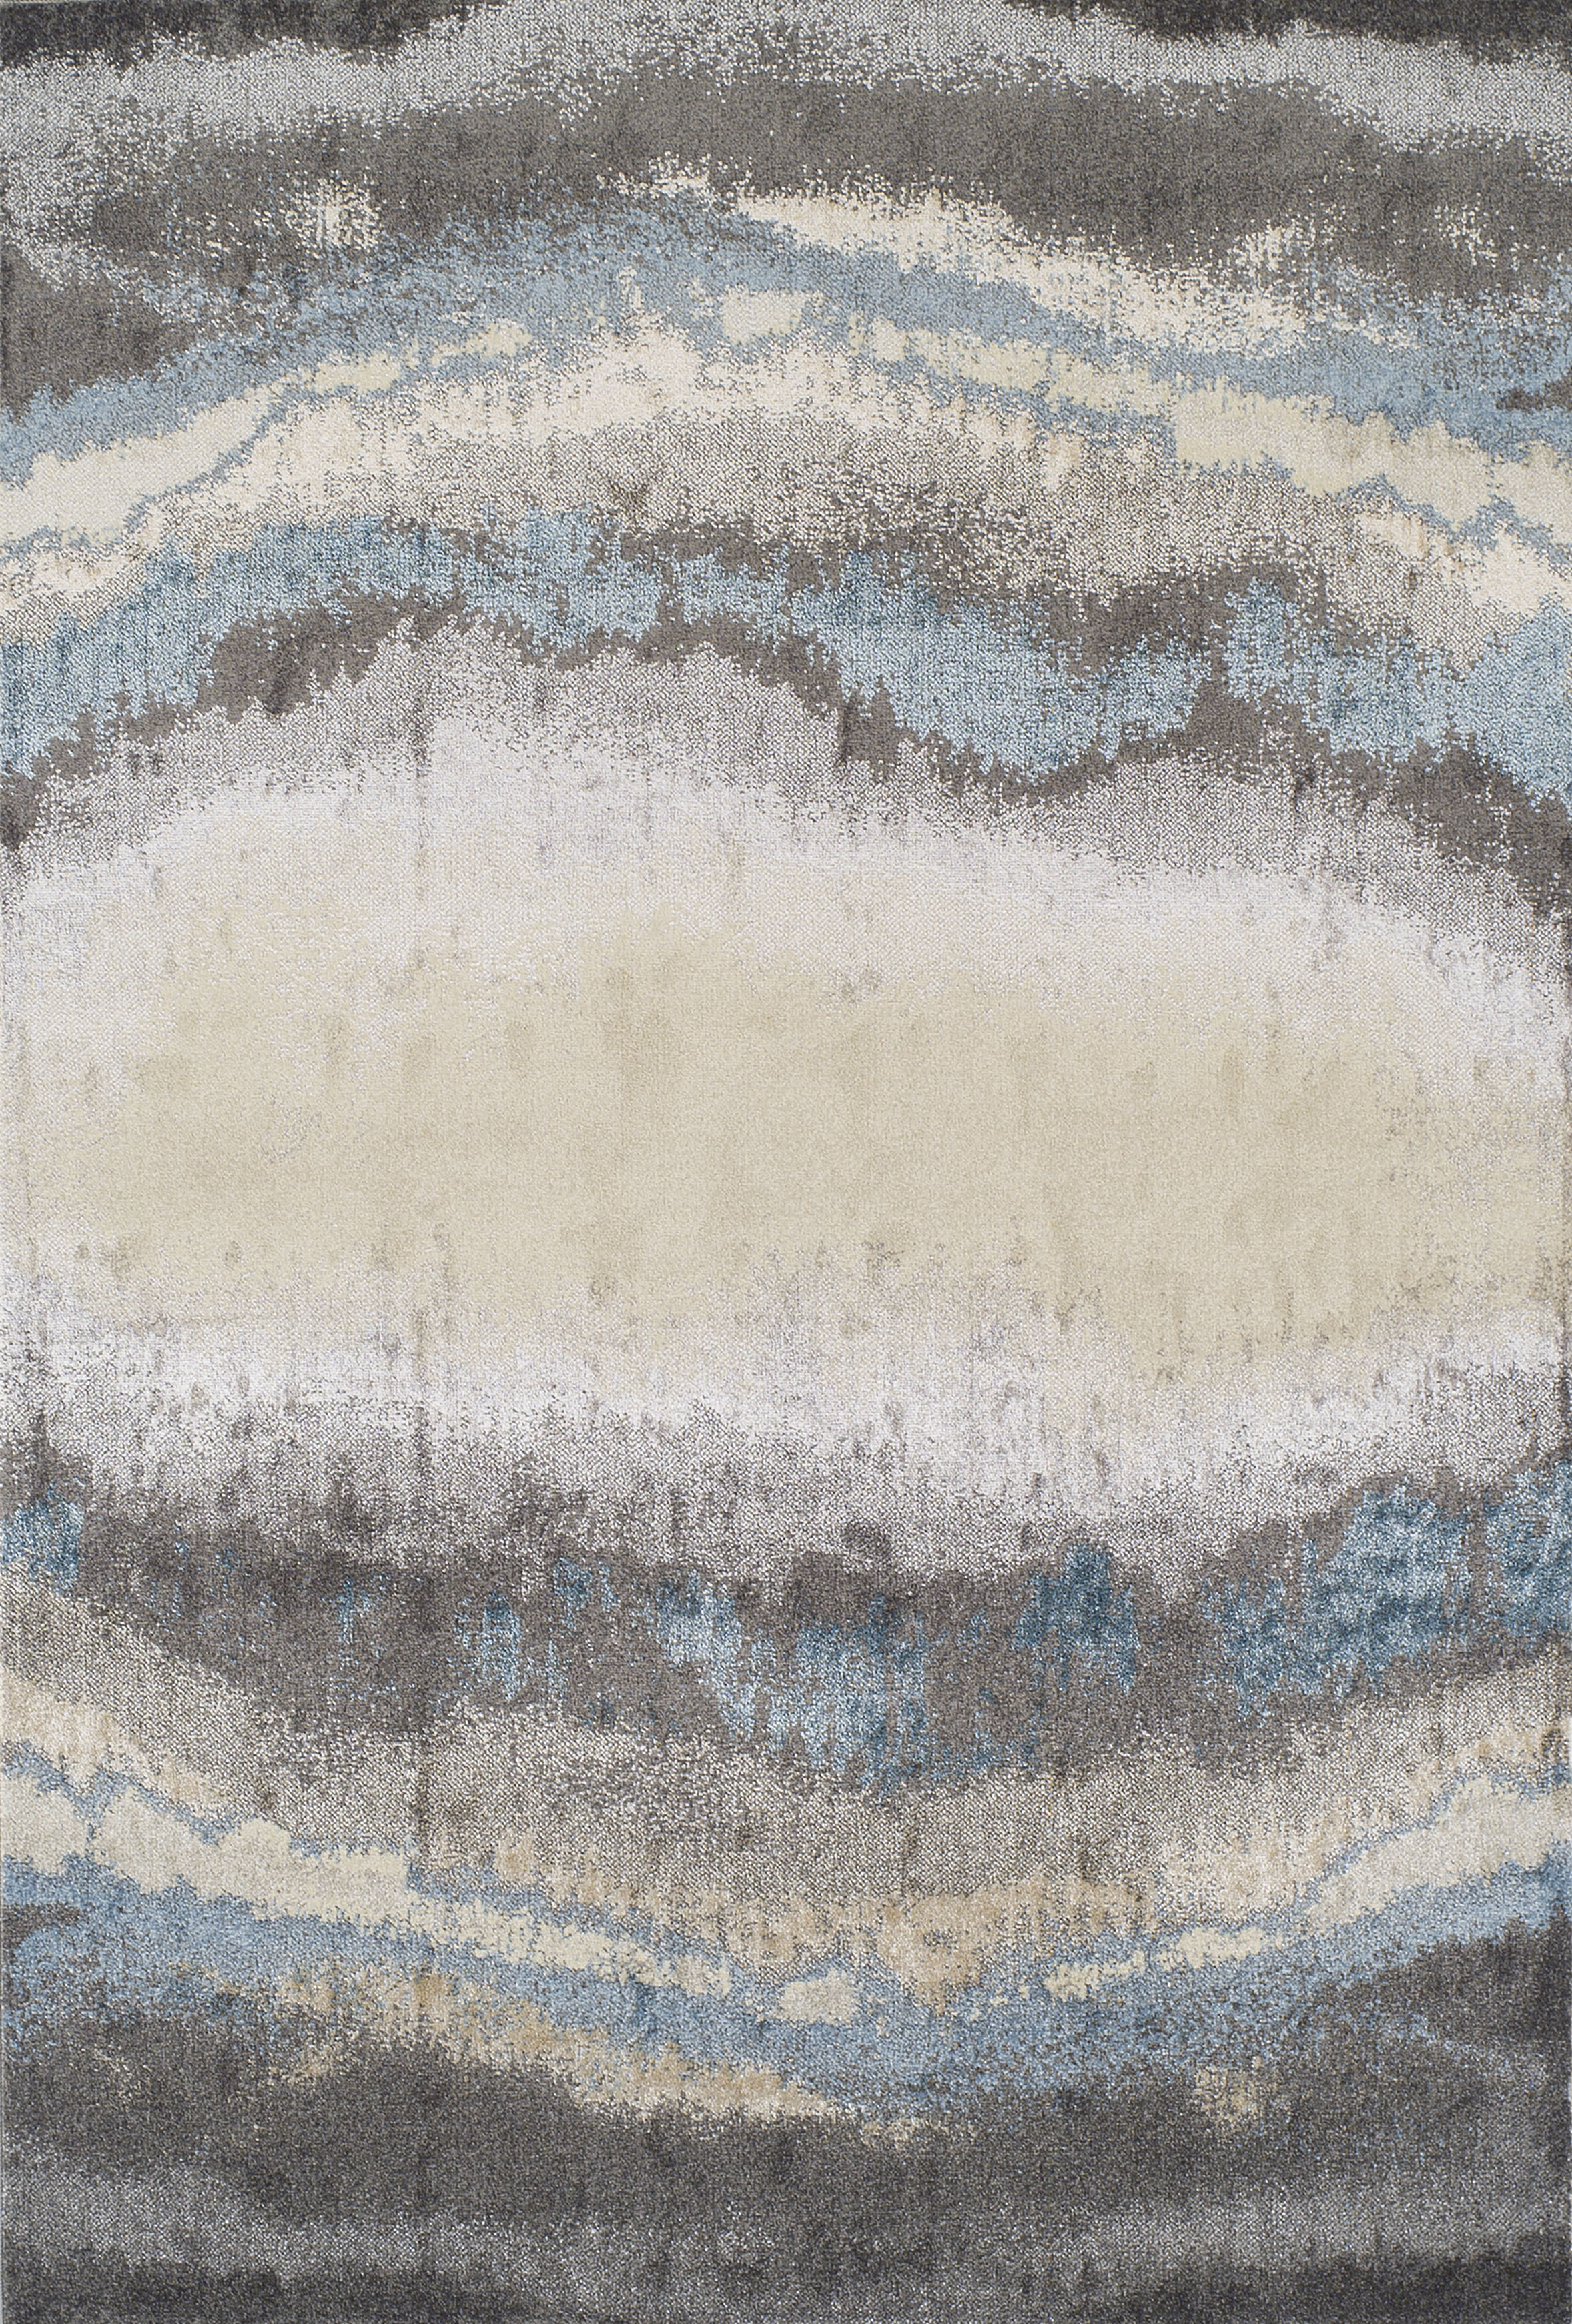 aa550 pewter lapama rugs